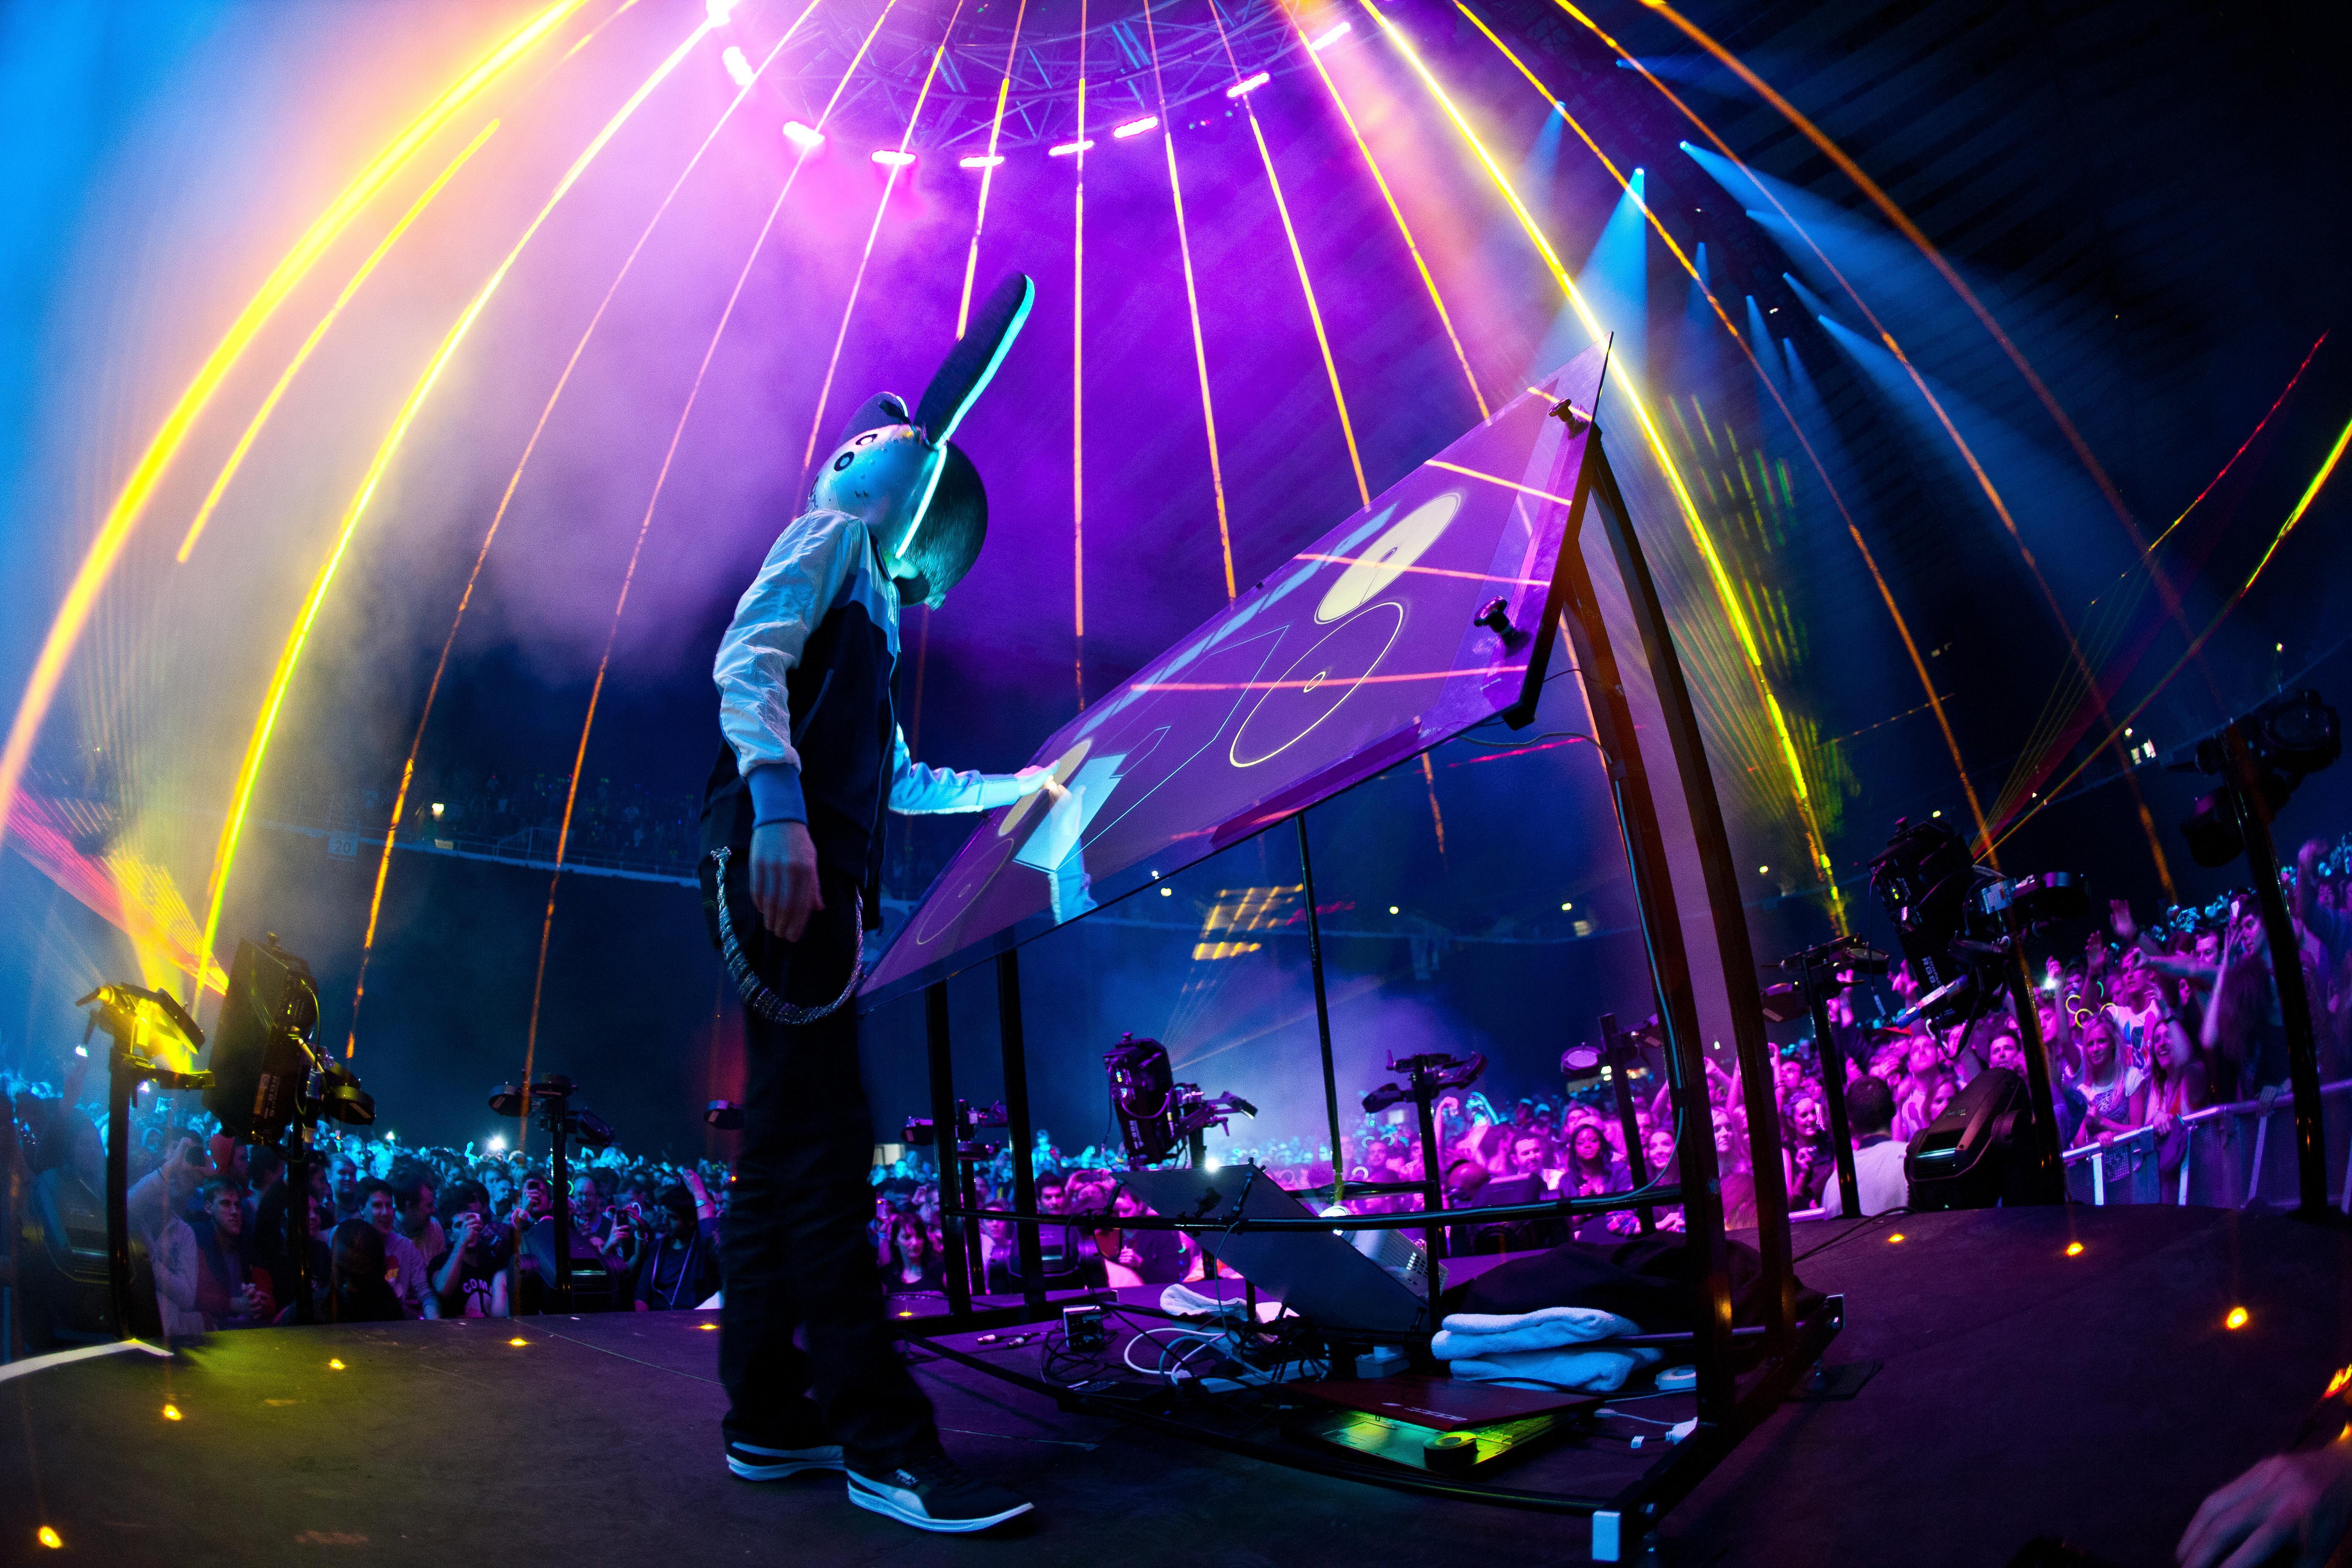 Dj Wallpapers Hd 2016: Weekend Rewind: Deadmau5's Epic 2008 Essential Mix